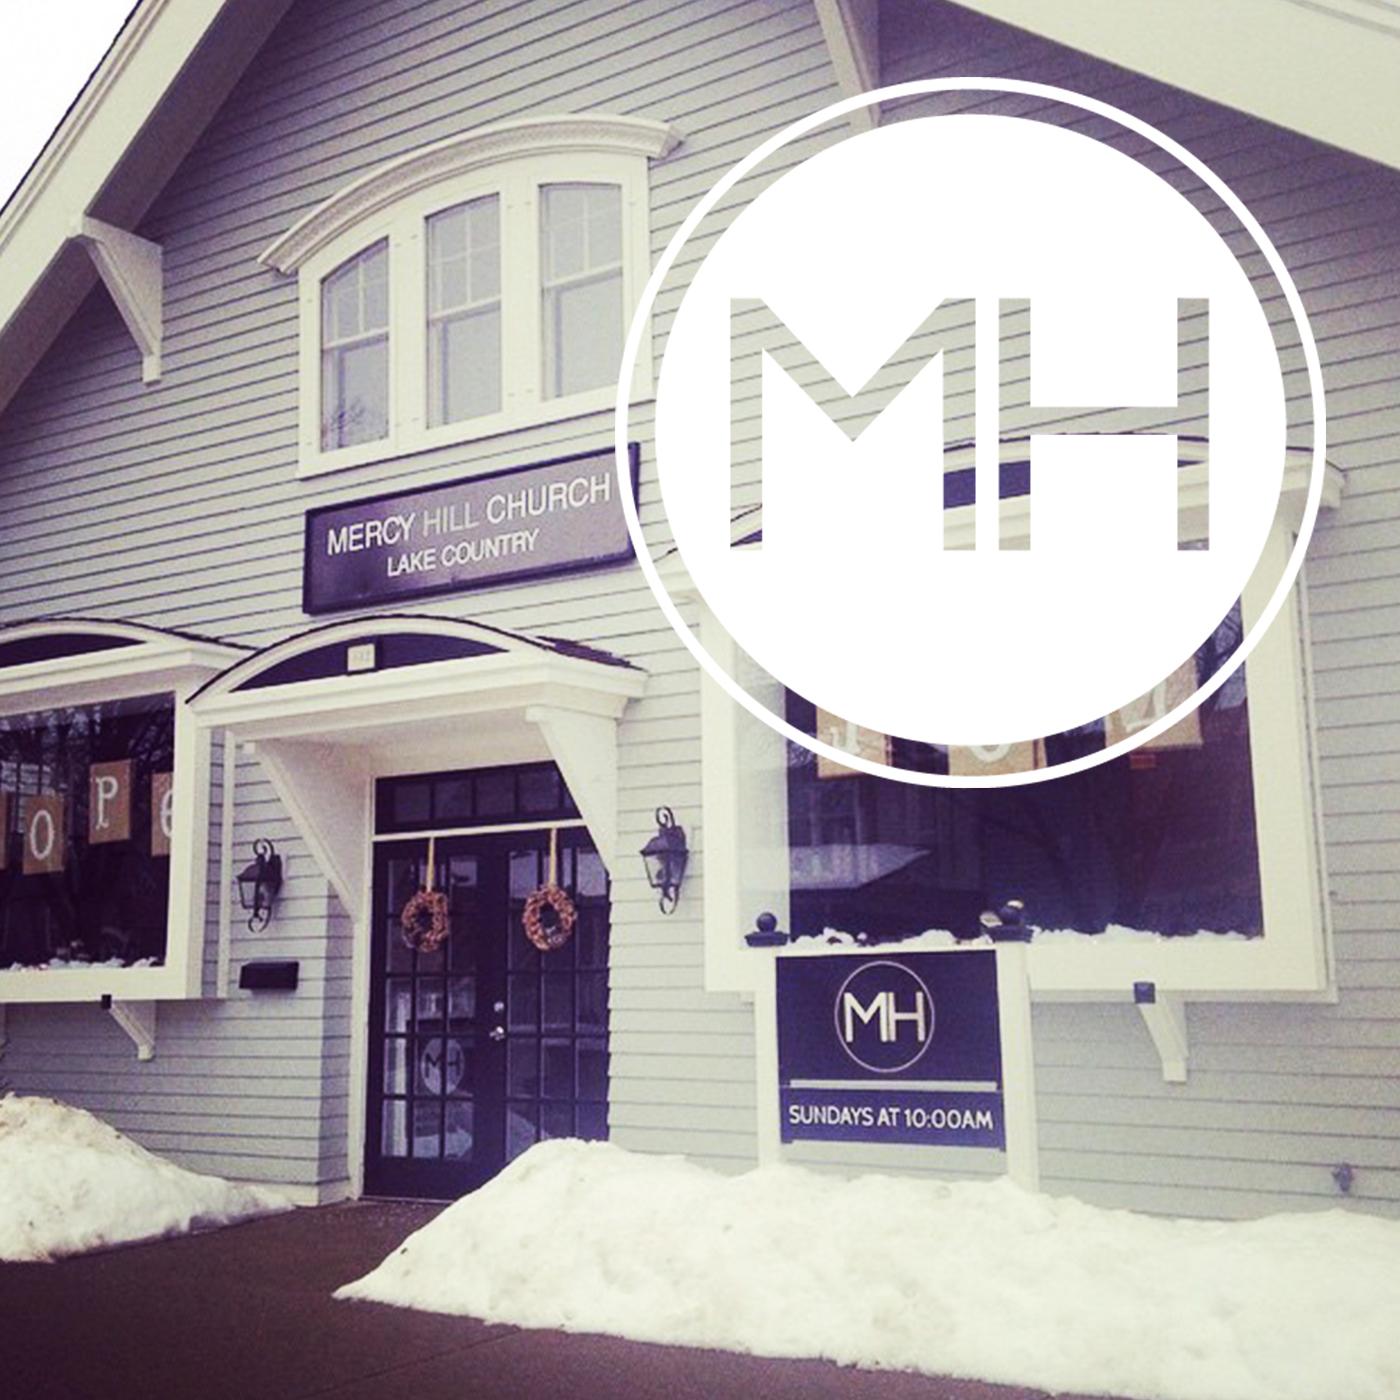 Lake Country Media - Mercy Hill Church